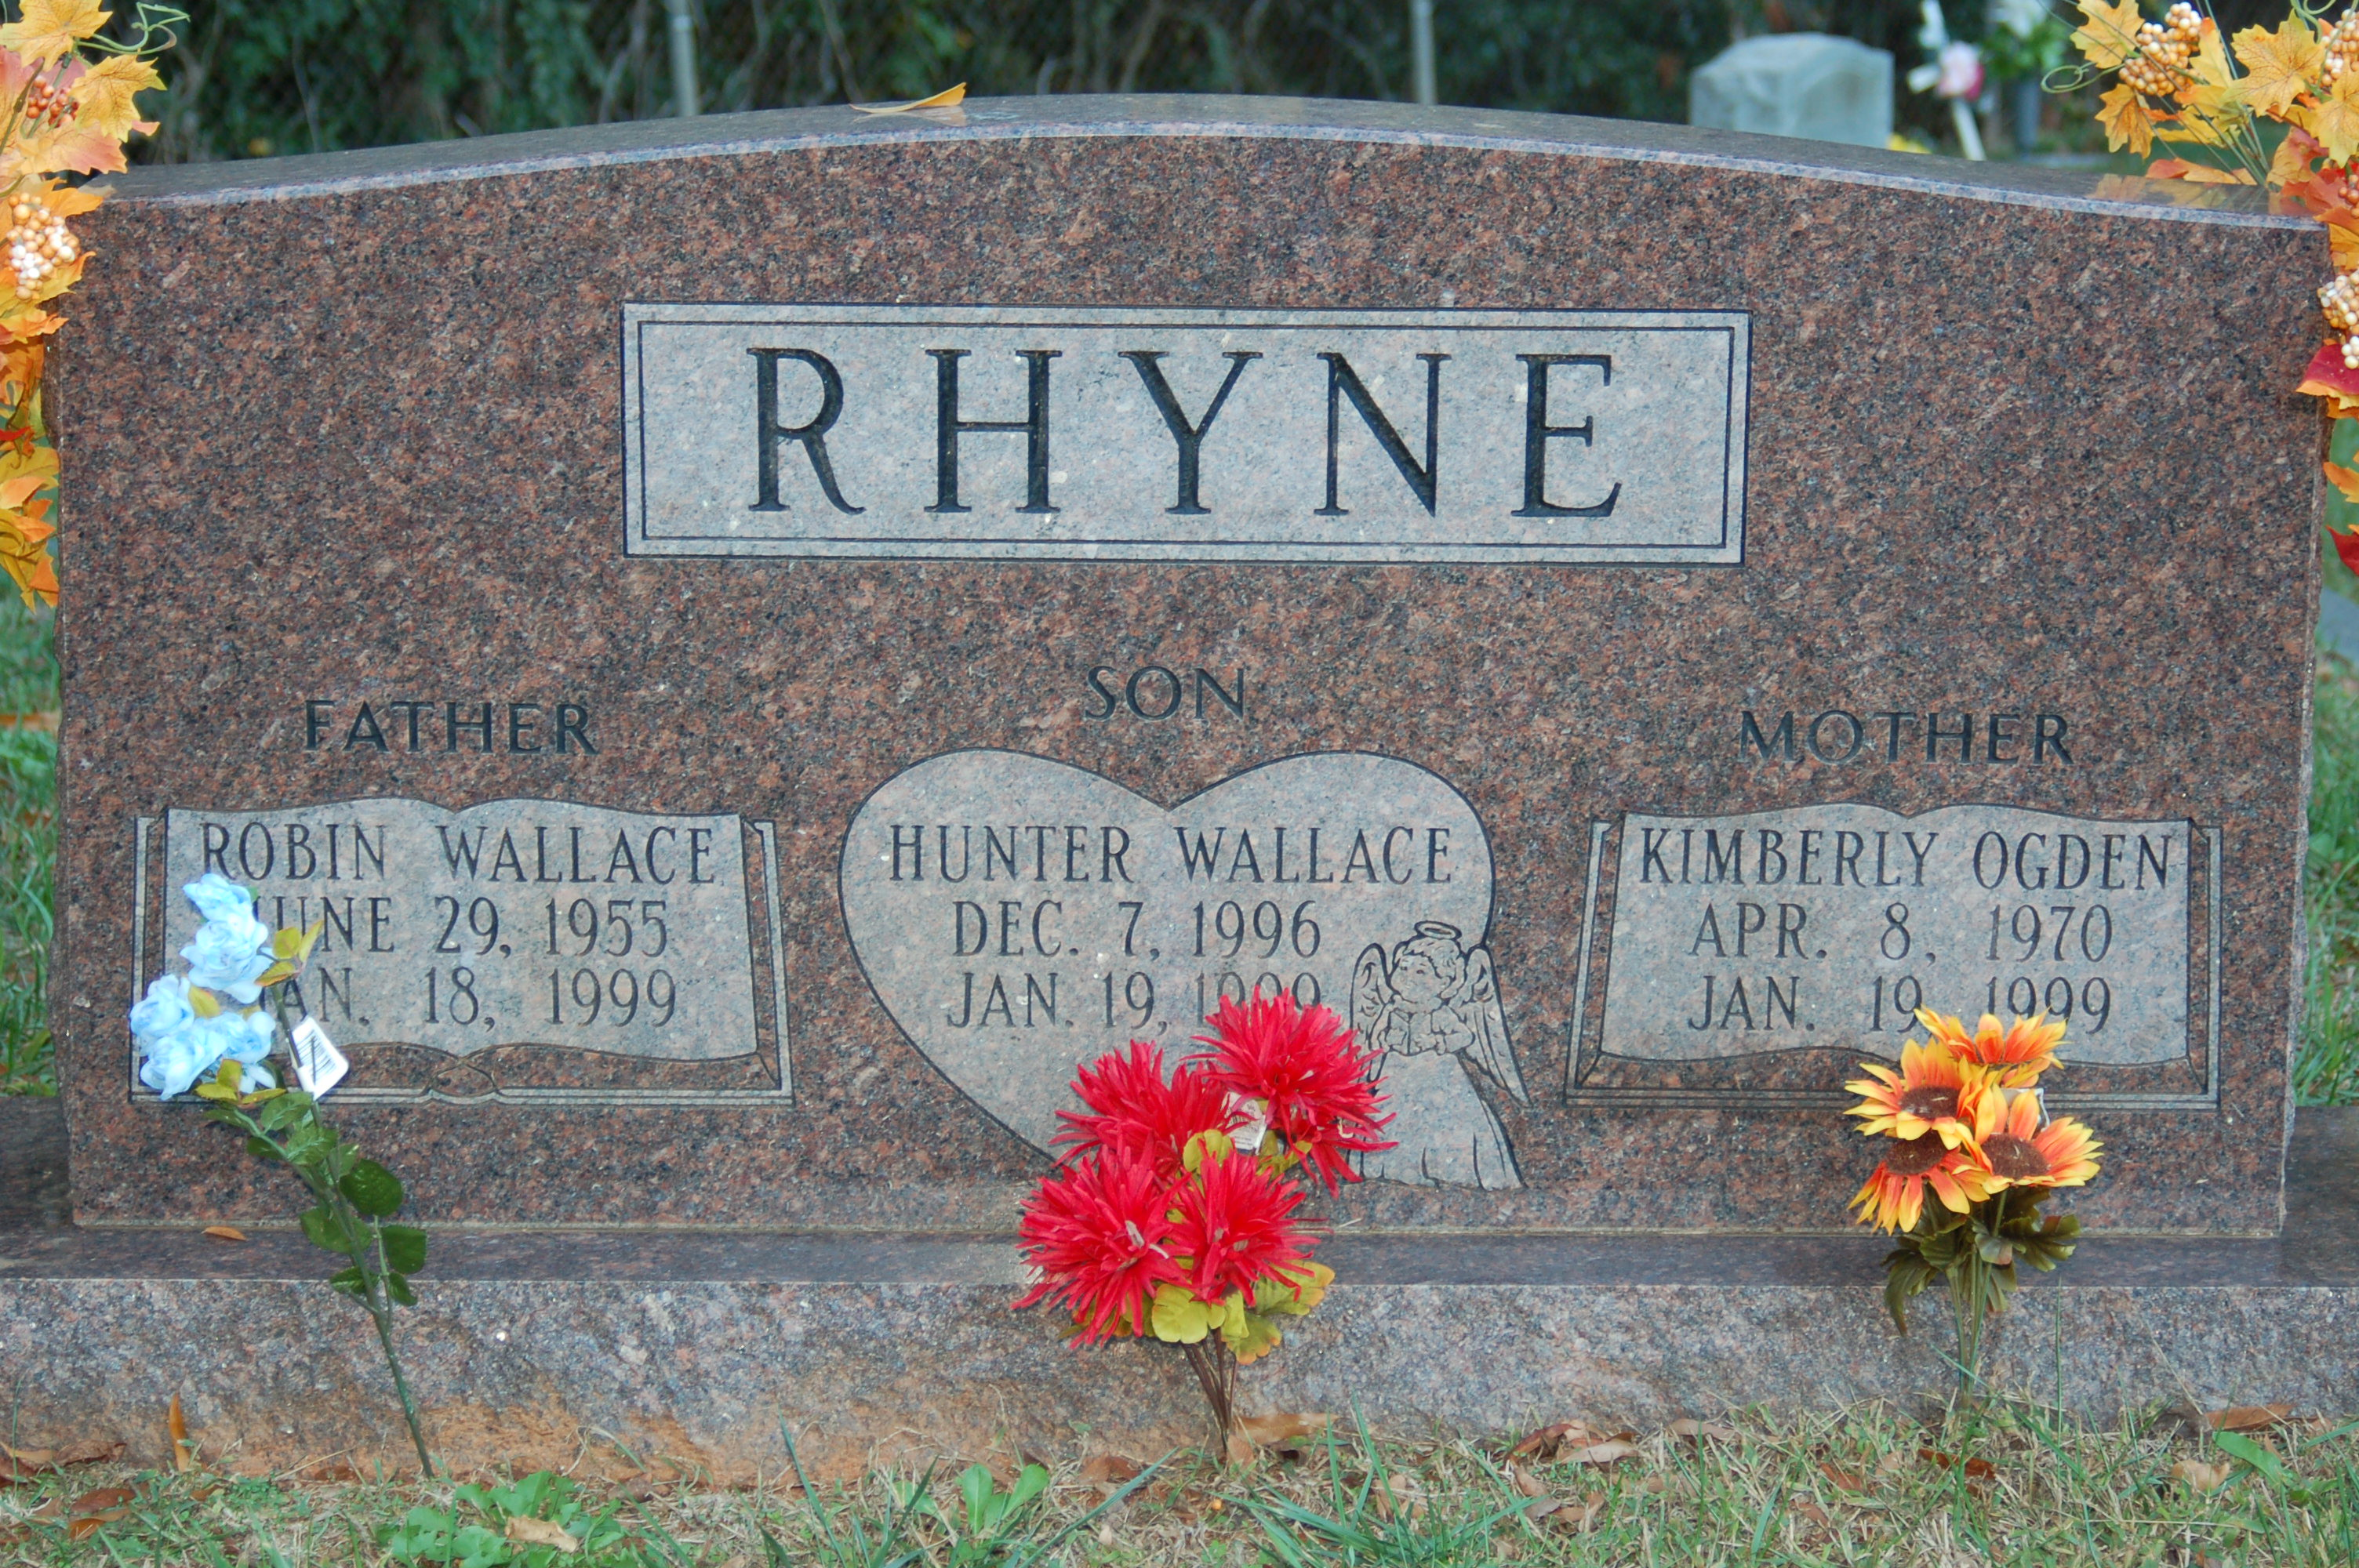 Robin Wallace Rhyne